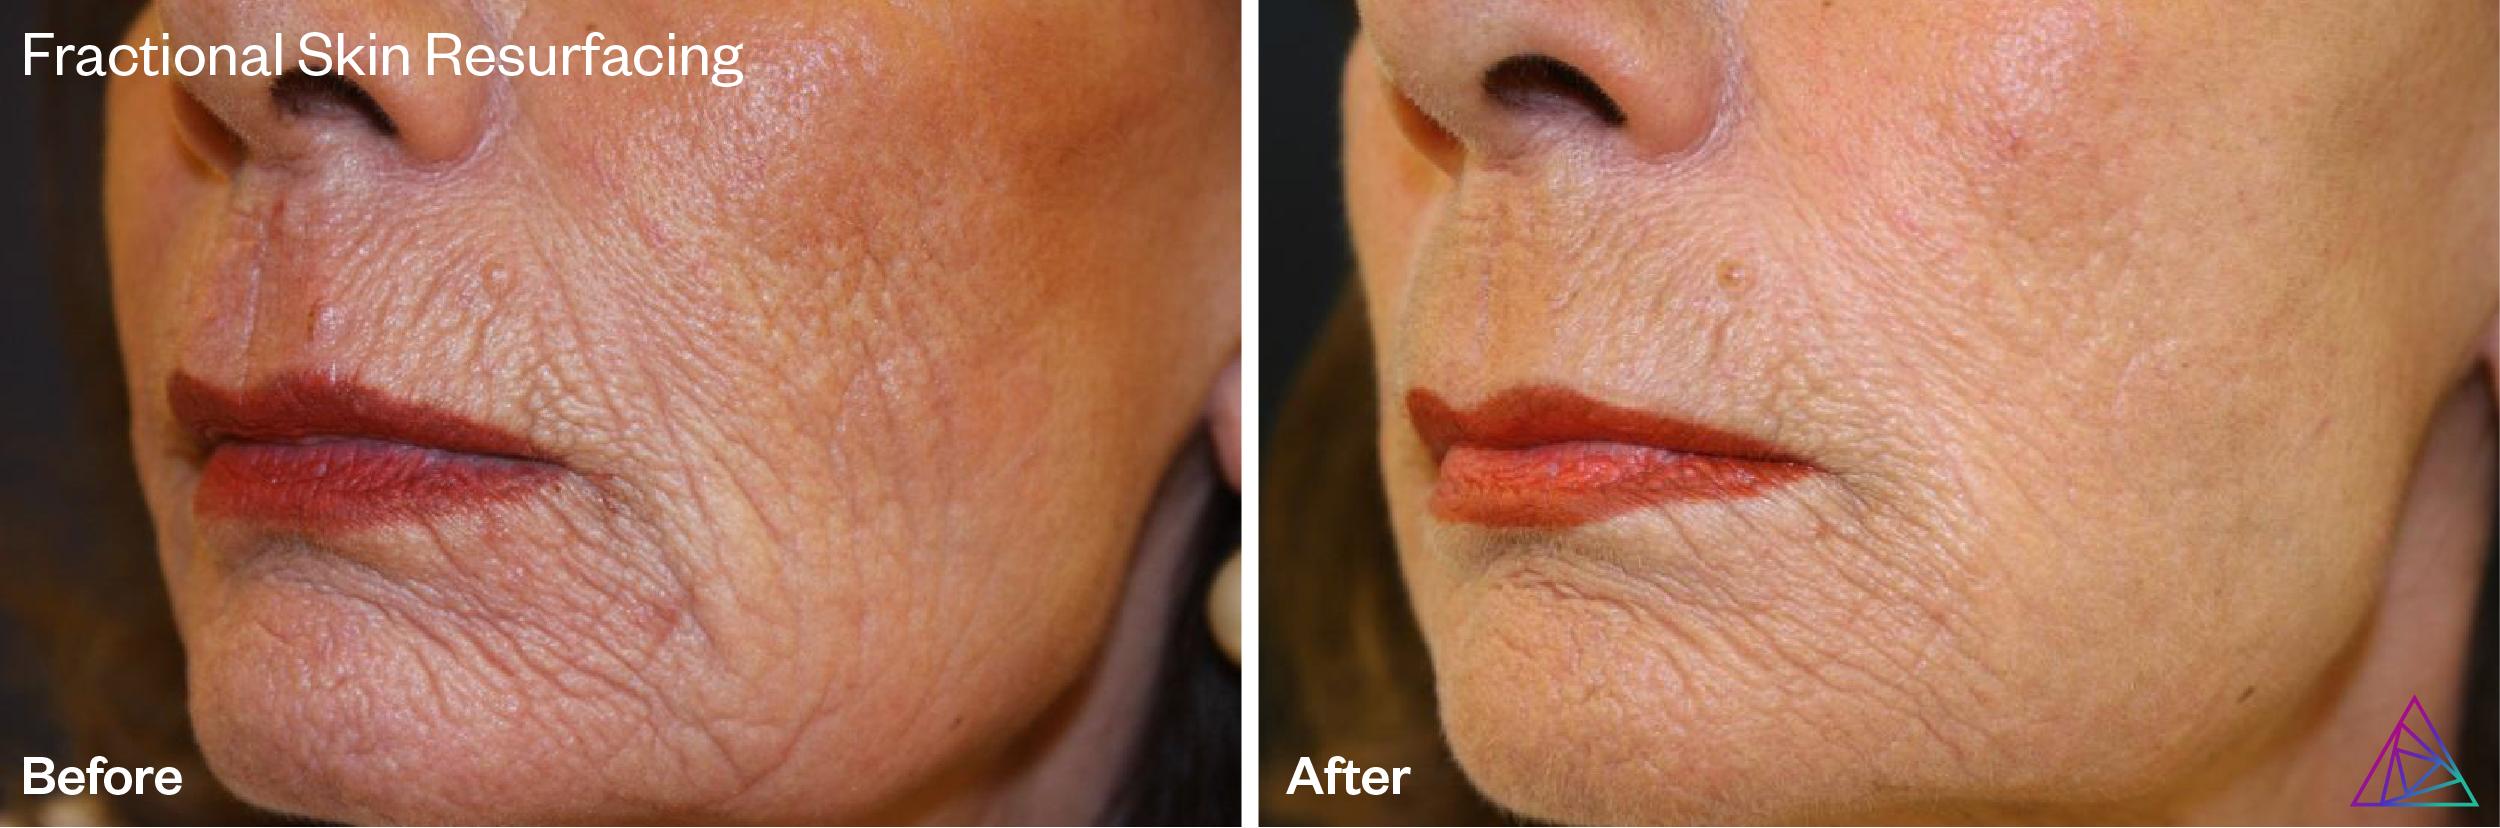 Fractional Skin Resurfacing by Astanza Laser